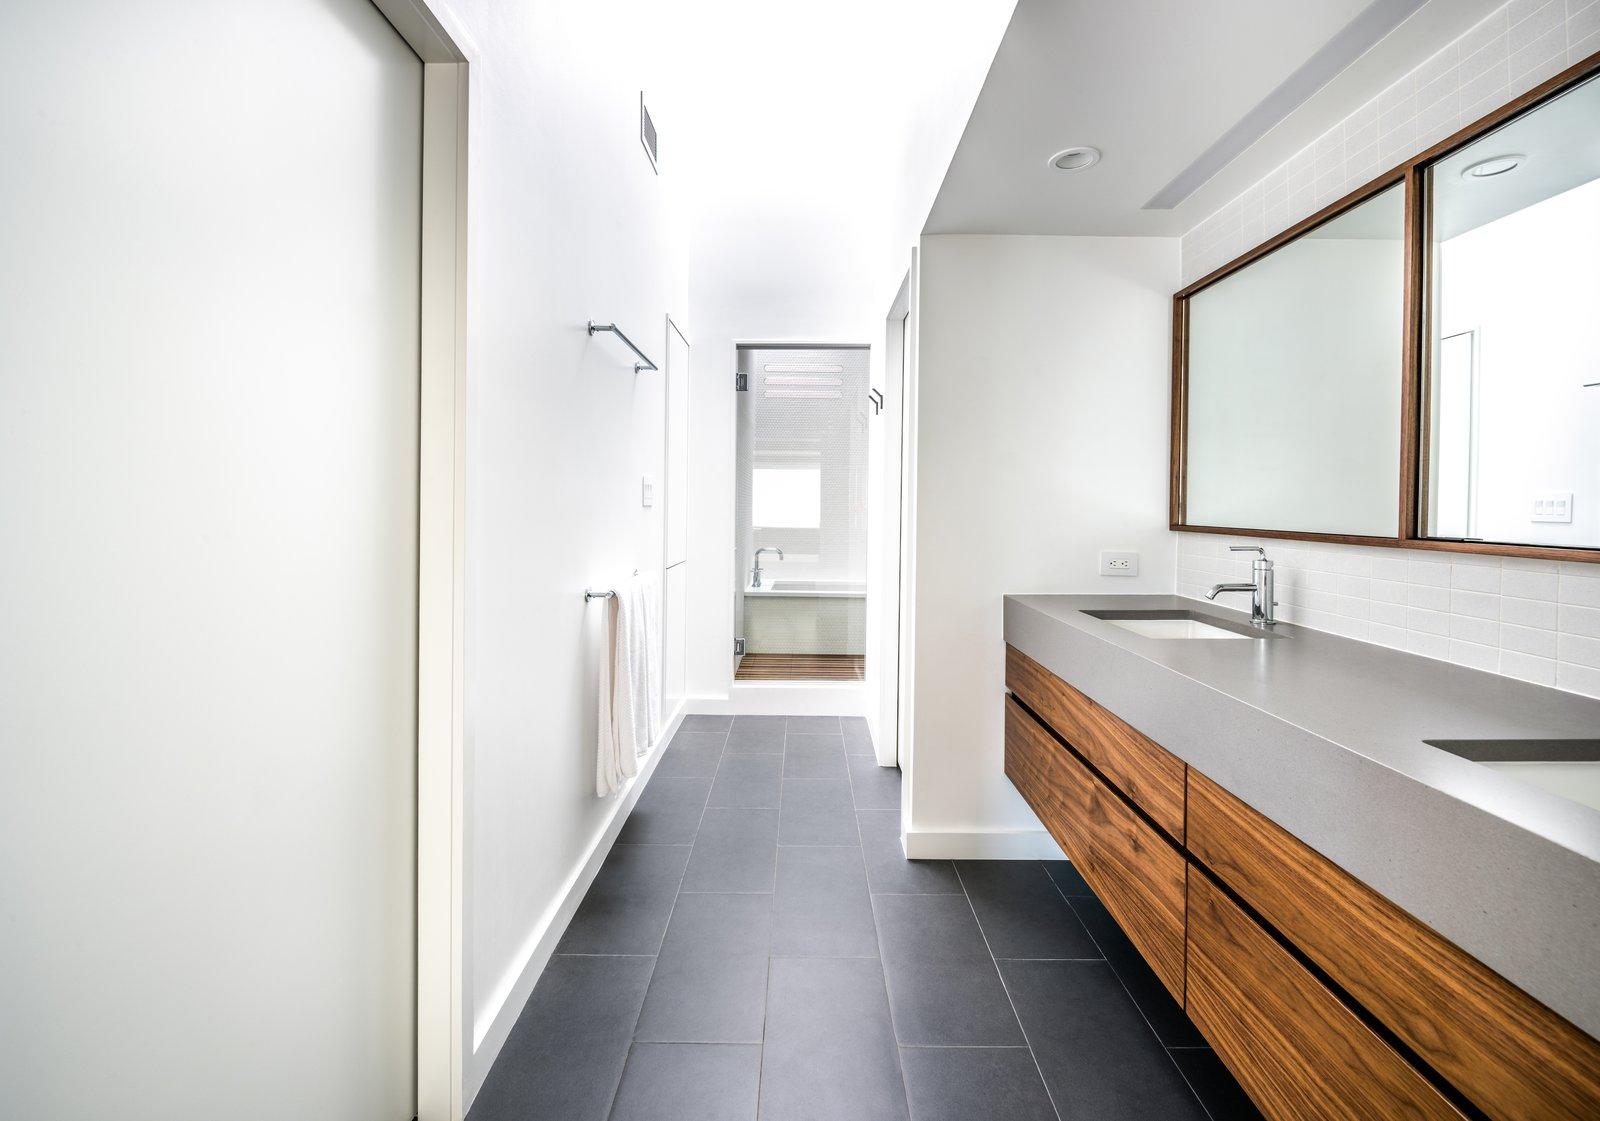 Bath, Recessed, Ceramic Tile, Undermount, Ceiling, Undermount, Enclosed, Ceramic Tile, and Engineered Quartz Master Bathroom - After  Best Bath Undermount Enclosed Ceramic Tile Photos from Throckmorton Renovation